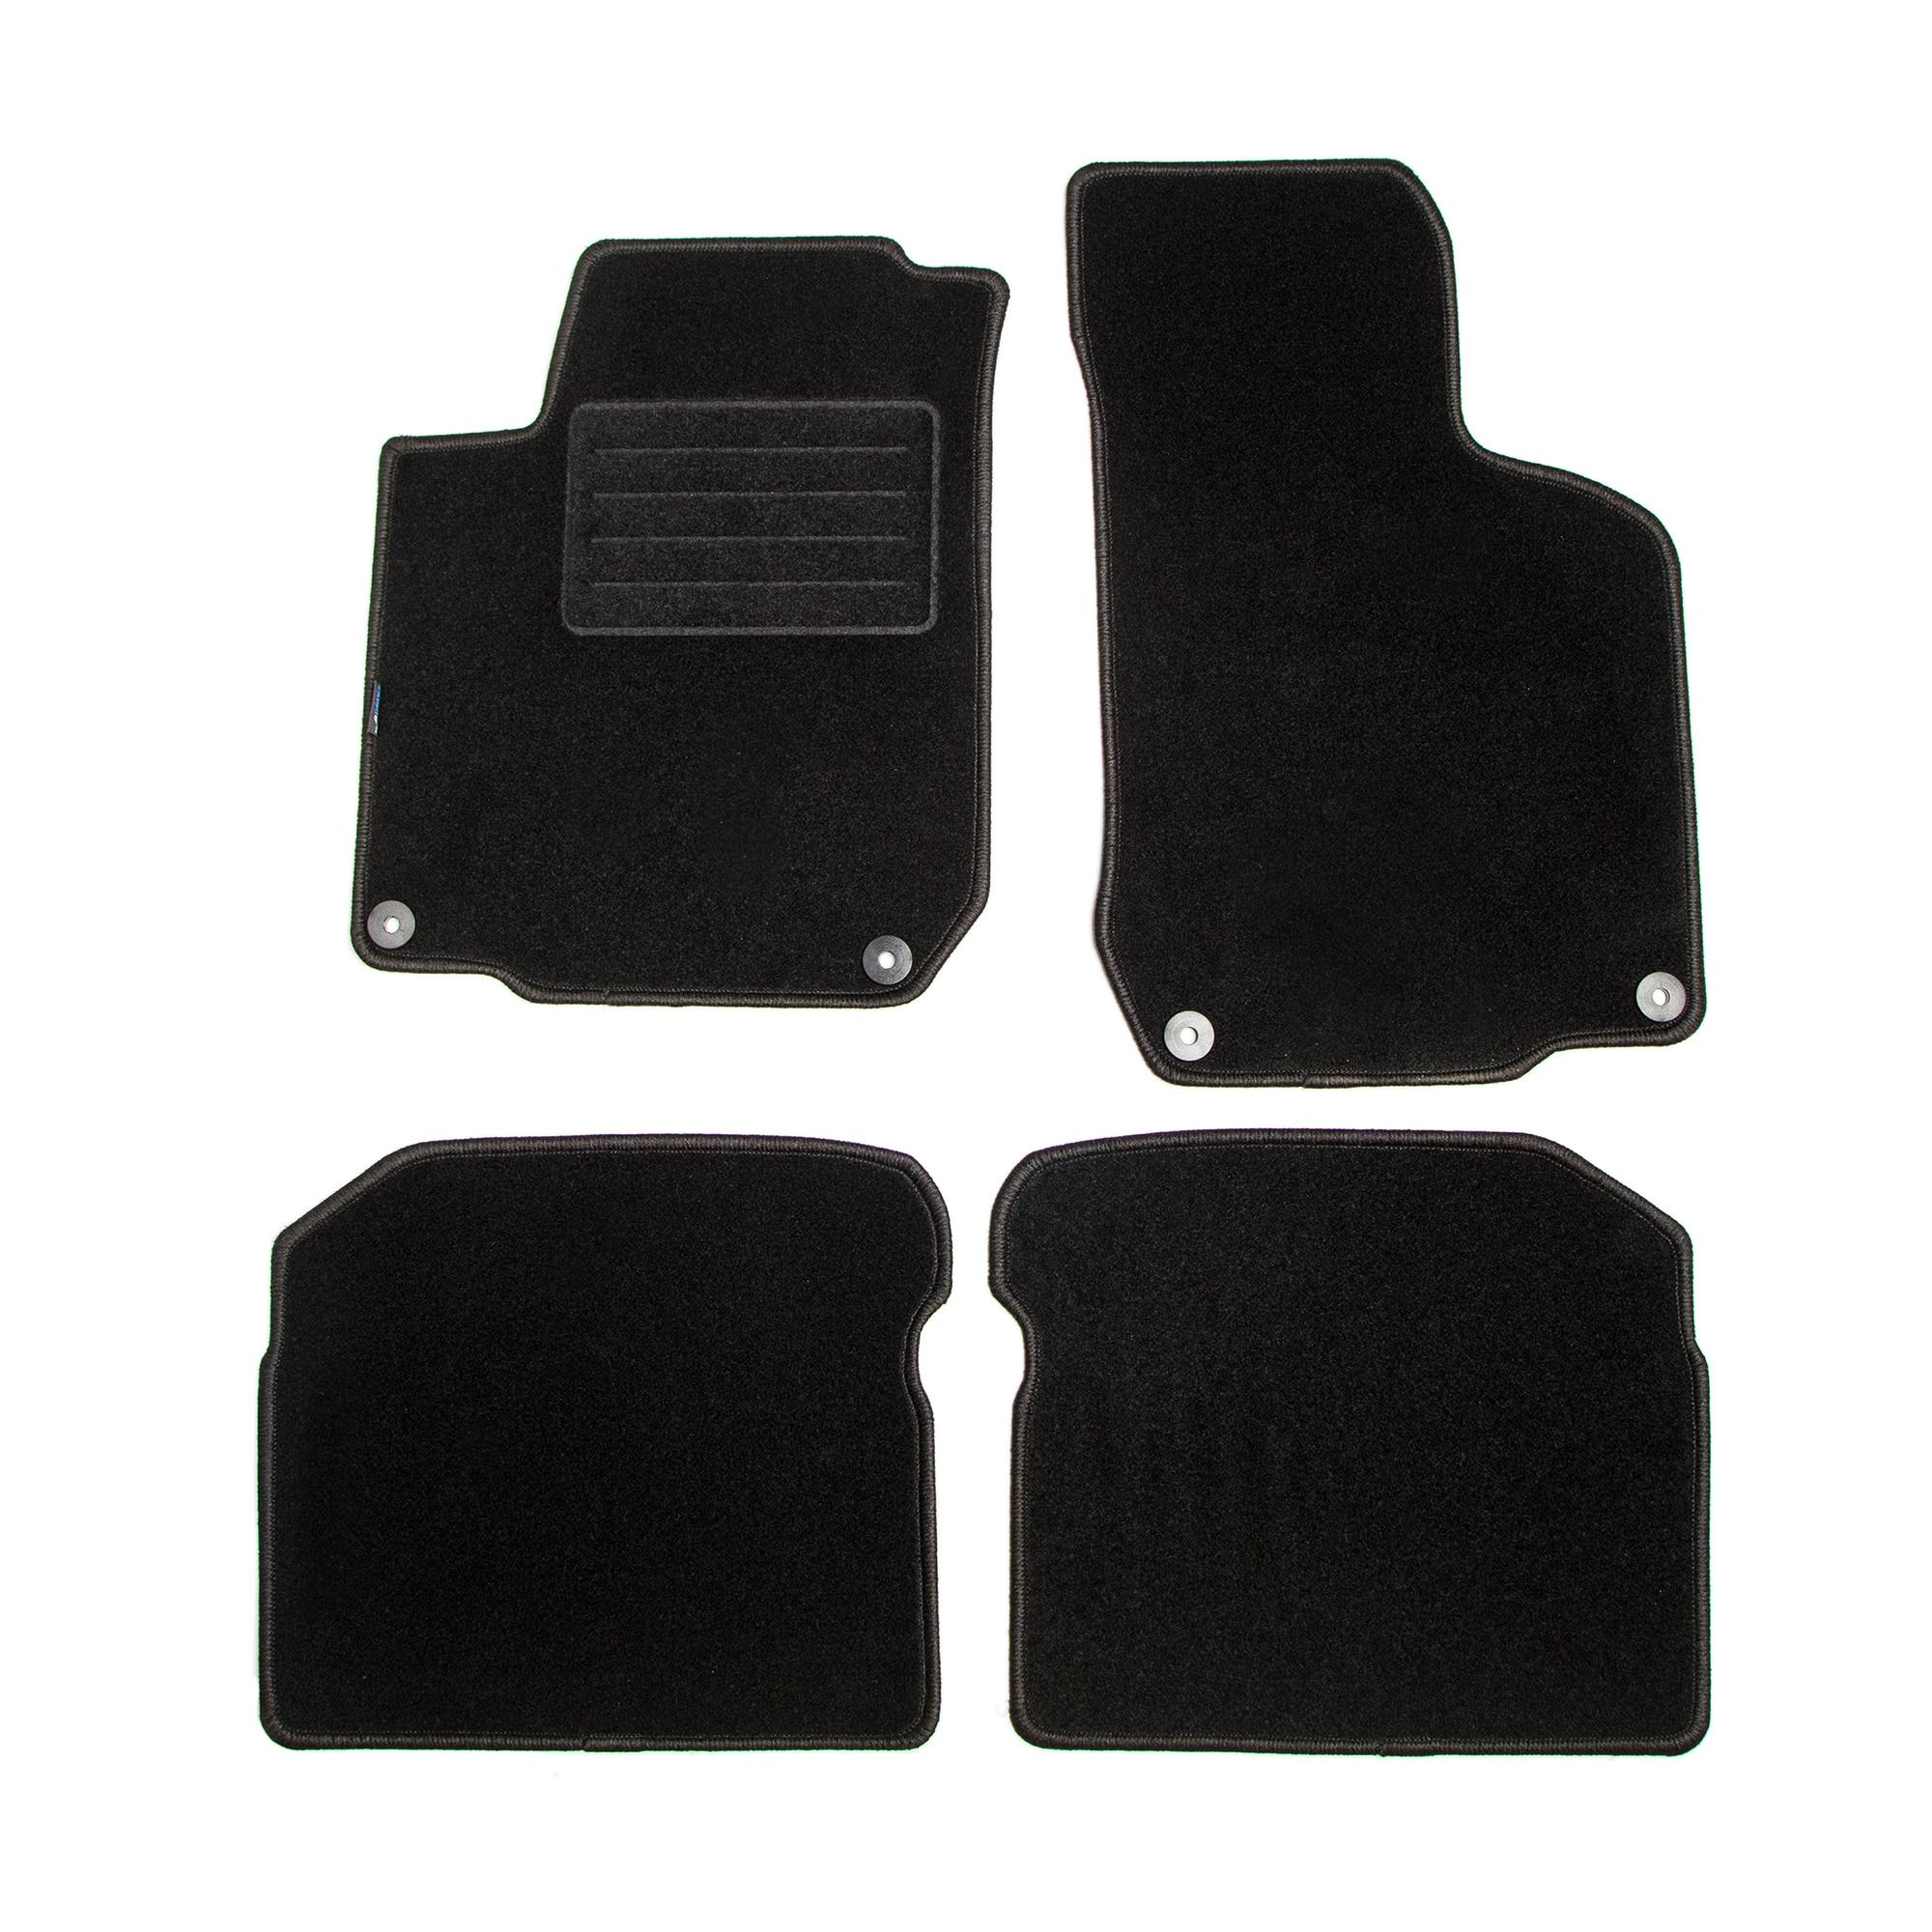 Fotografie Set 4 Covorase mocheta Petex pentru VW Golf VII, Golf VII Variant, Golf VII Alltrack 2012-2013, negru/grafit